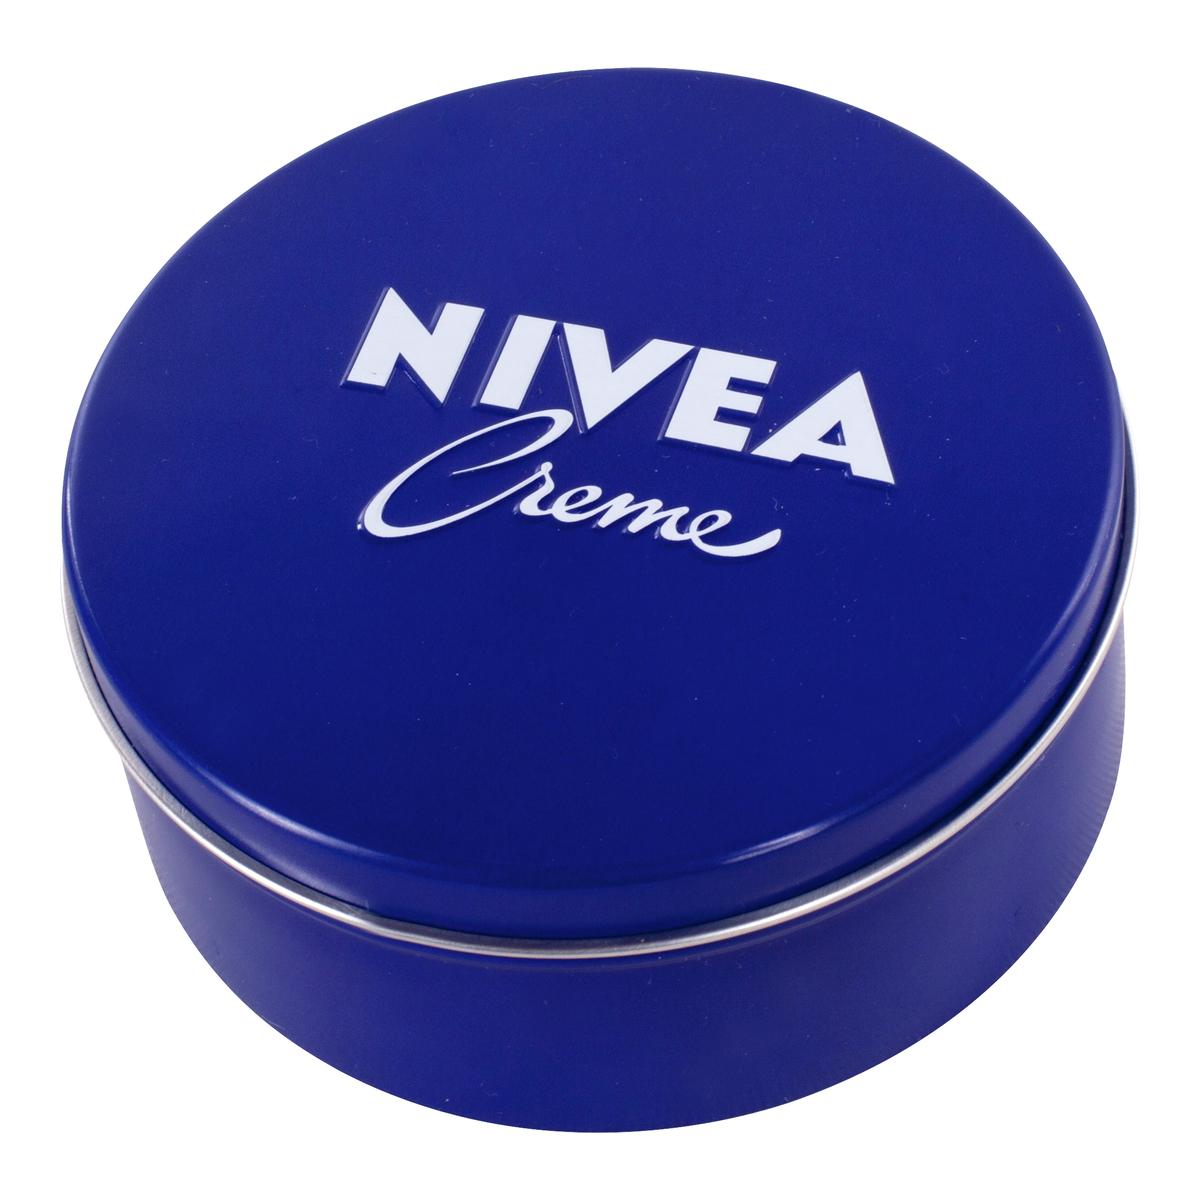 Nivea krem blåboks-KRE240